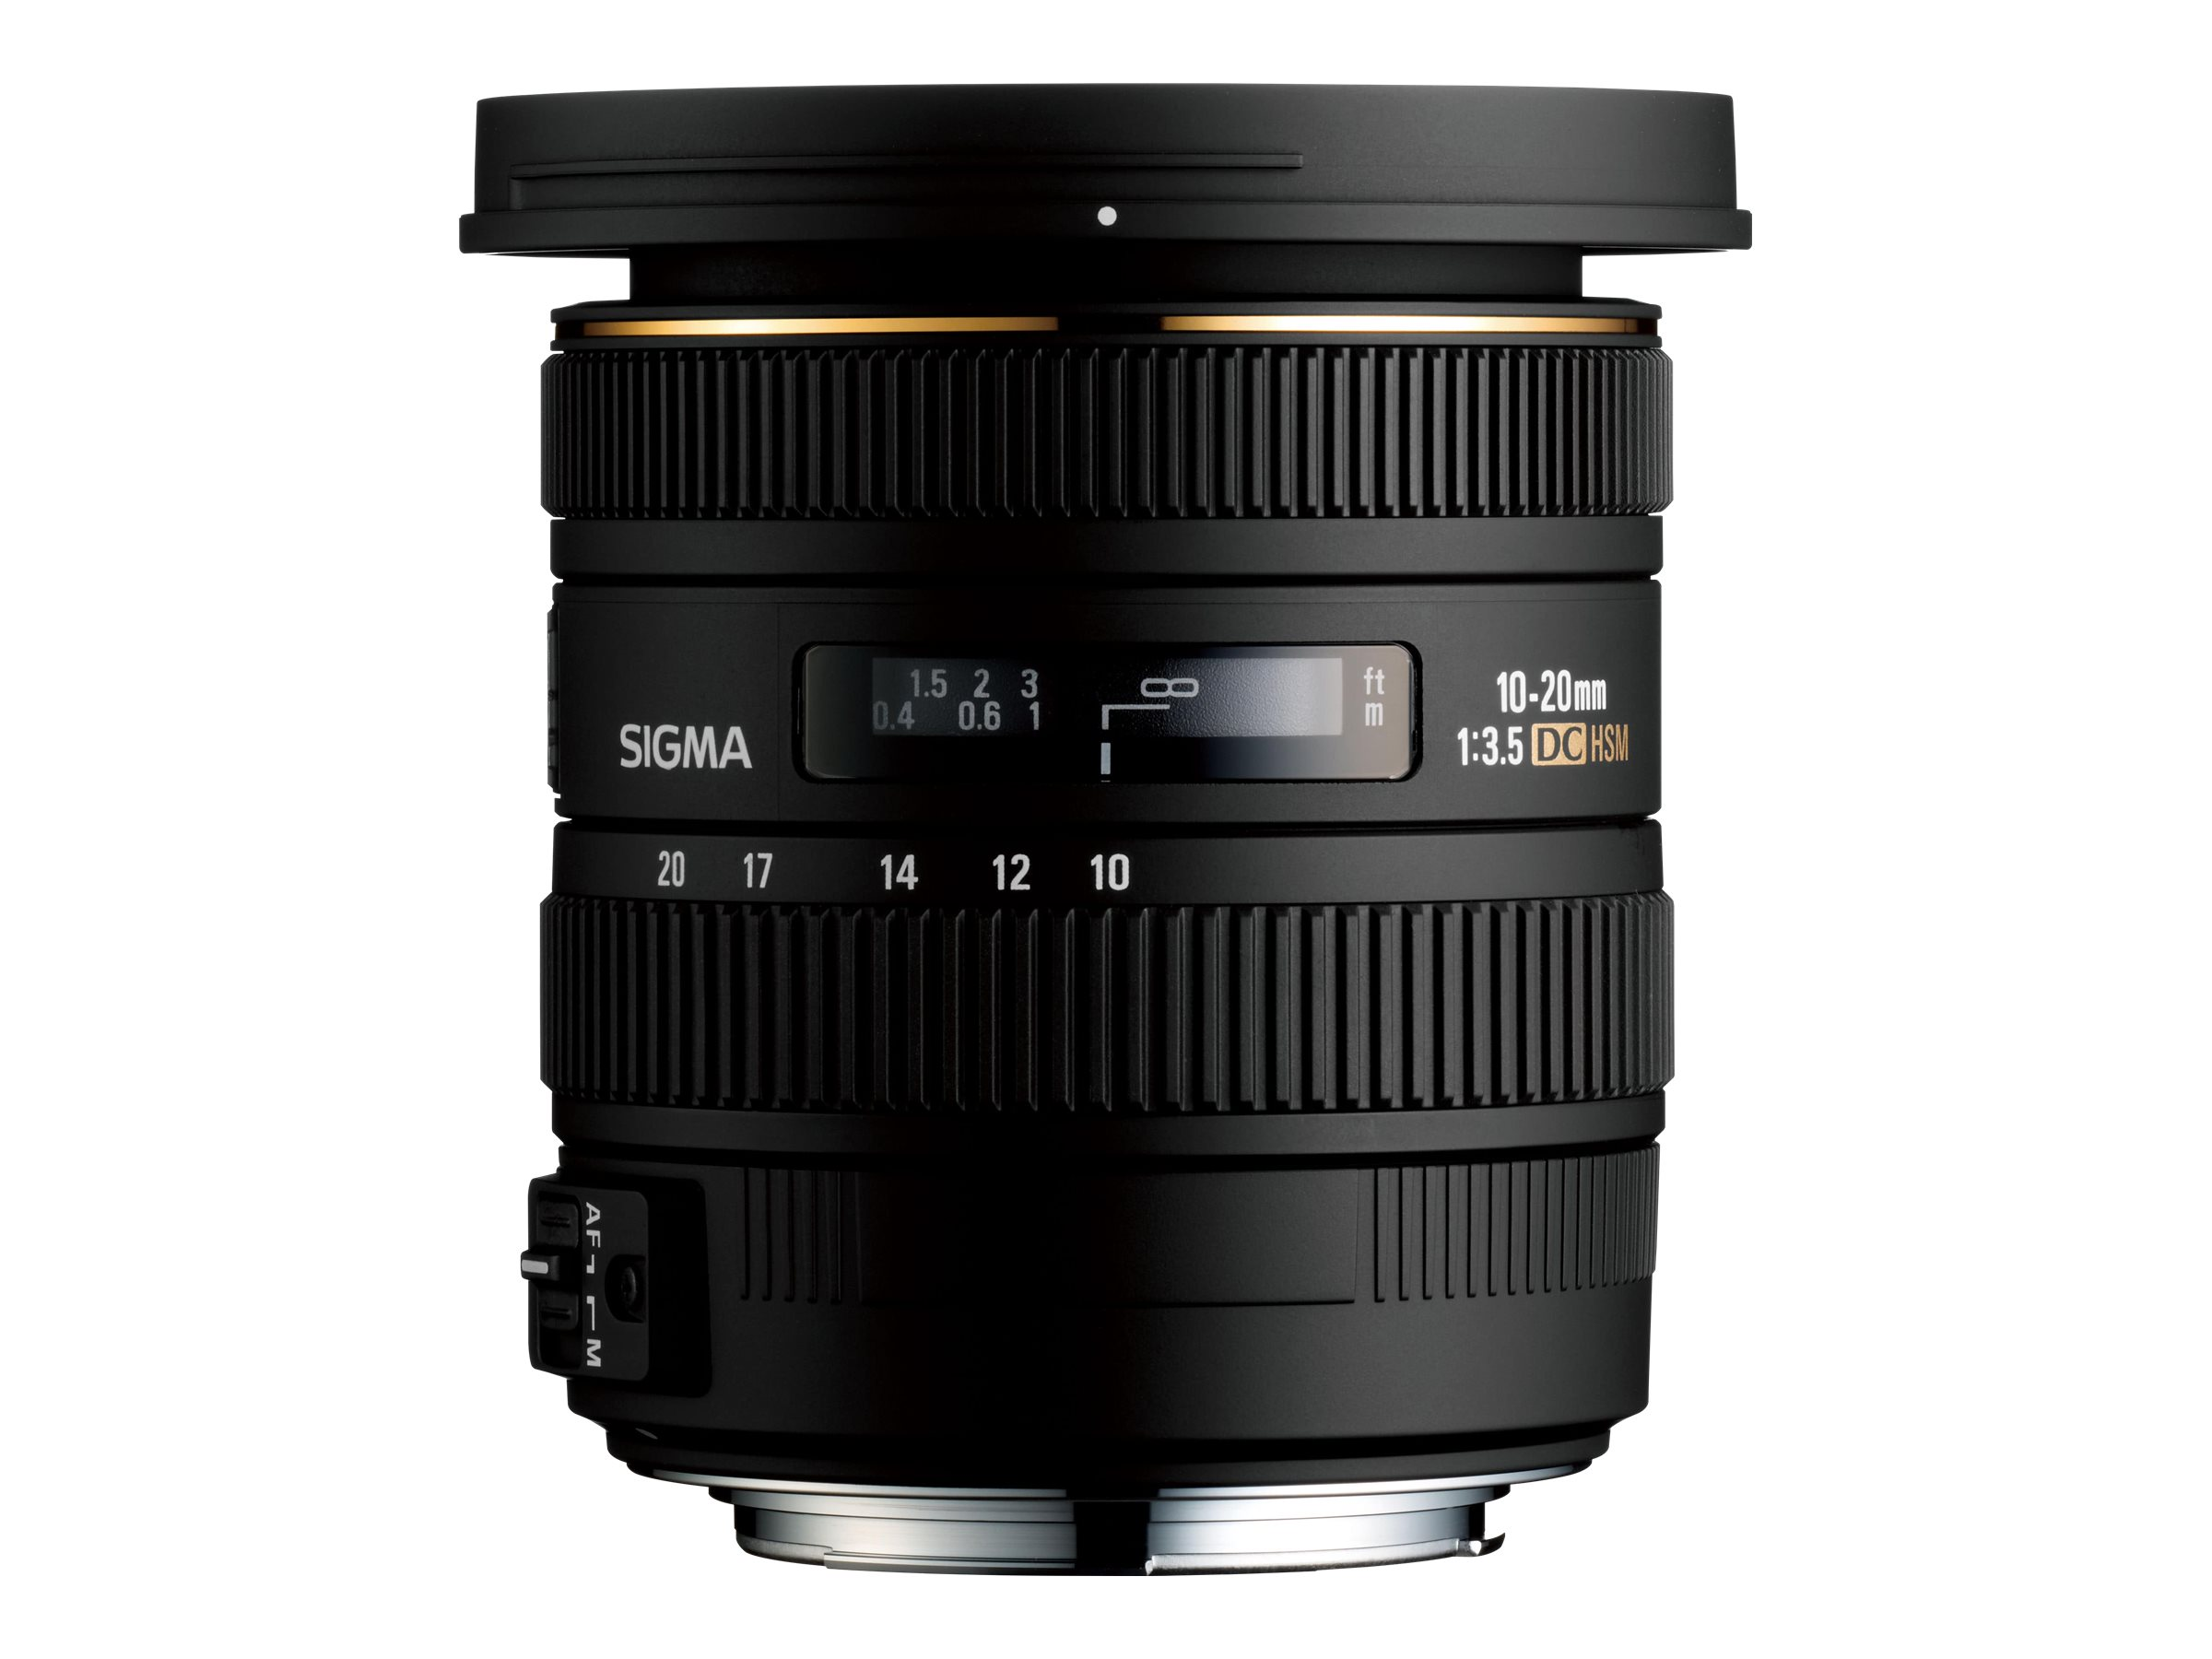 Sigma EX - Weitwinkel-Zoom-Objektiv - 10 mm - 20 mm - f/3.5 DC HSM - Canon EF